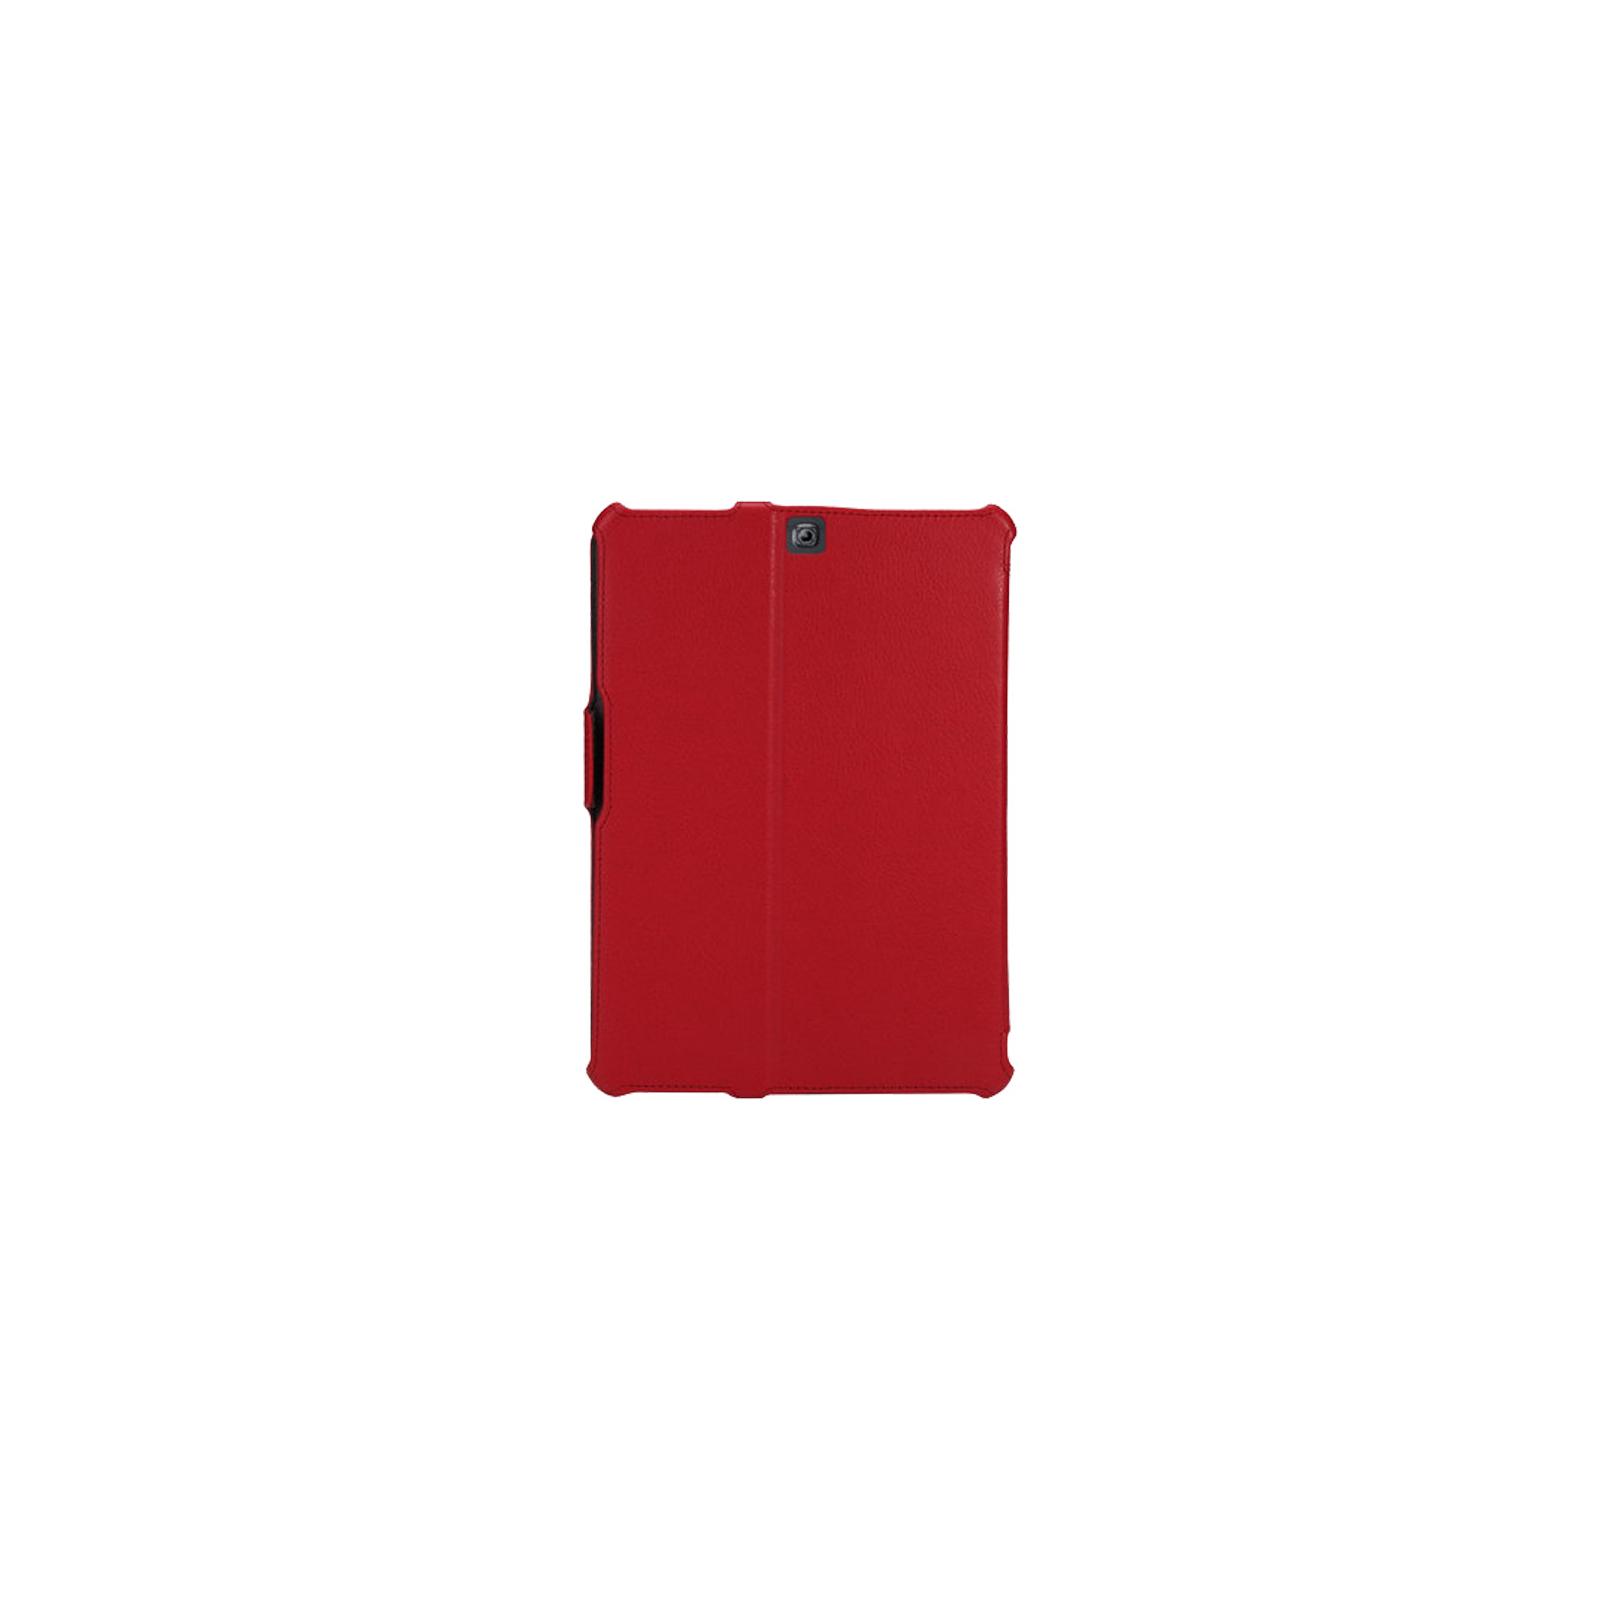 Чехол для планшета AirOn для Samsung Galaxy Tab S 2 9.7 red (4822352777456) изображение 2